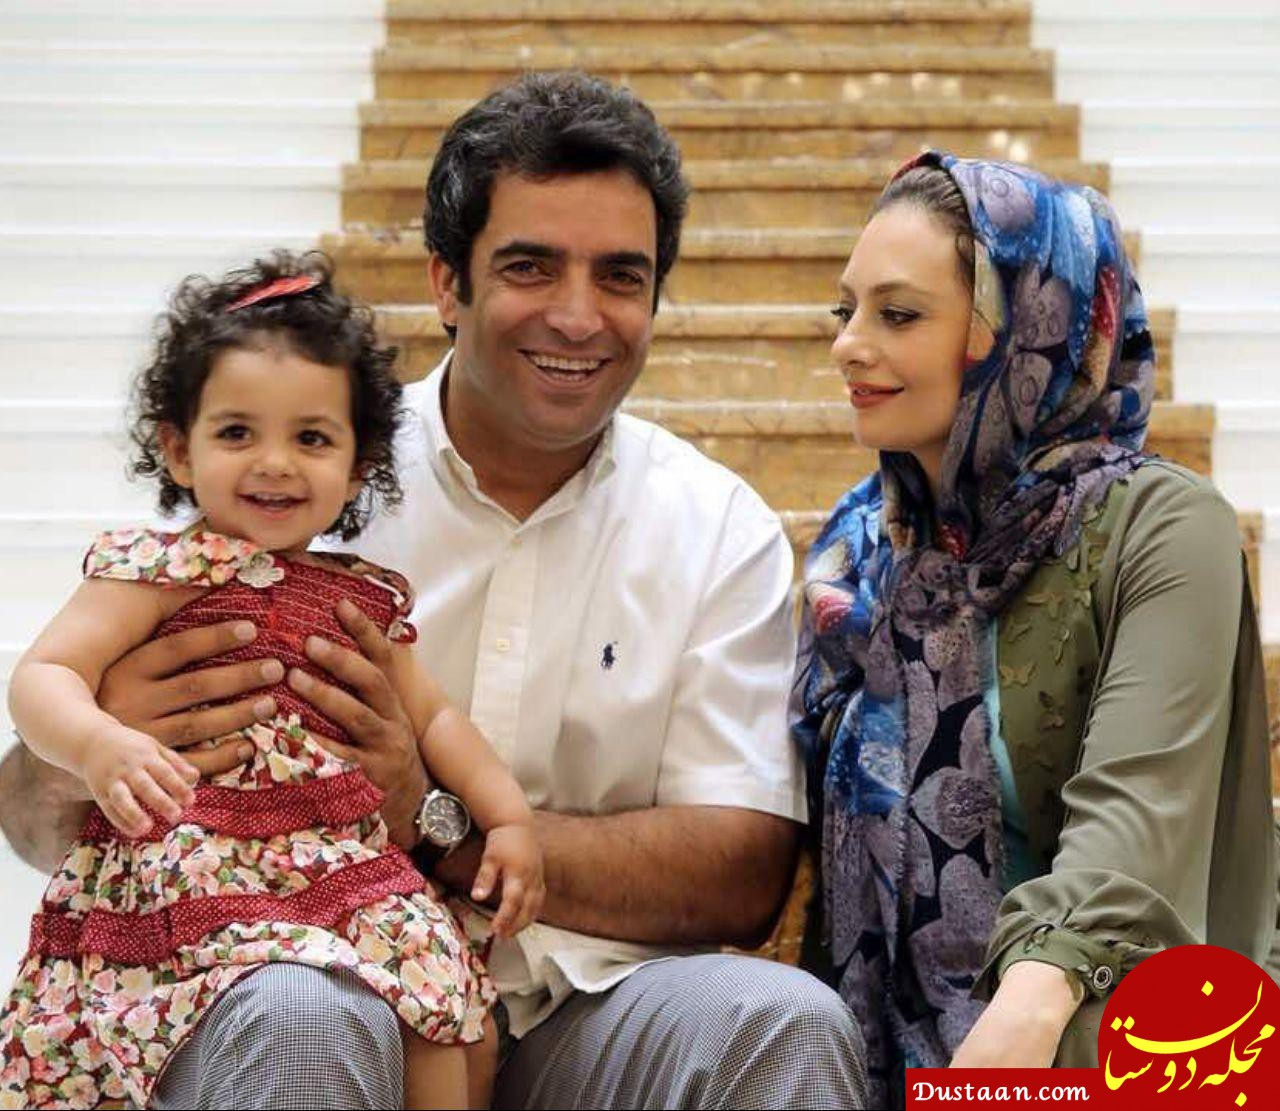 www.dustaan.com سالگرد ازدواج یکتا ناصر و منوچهر هادی +عکس